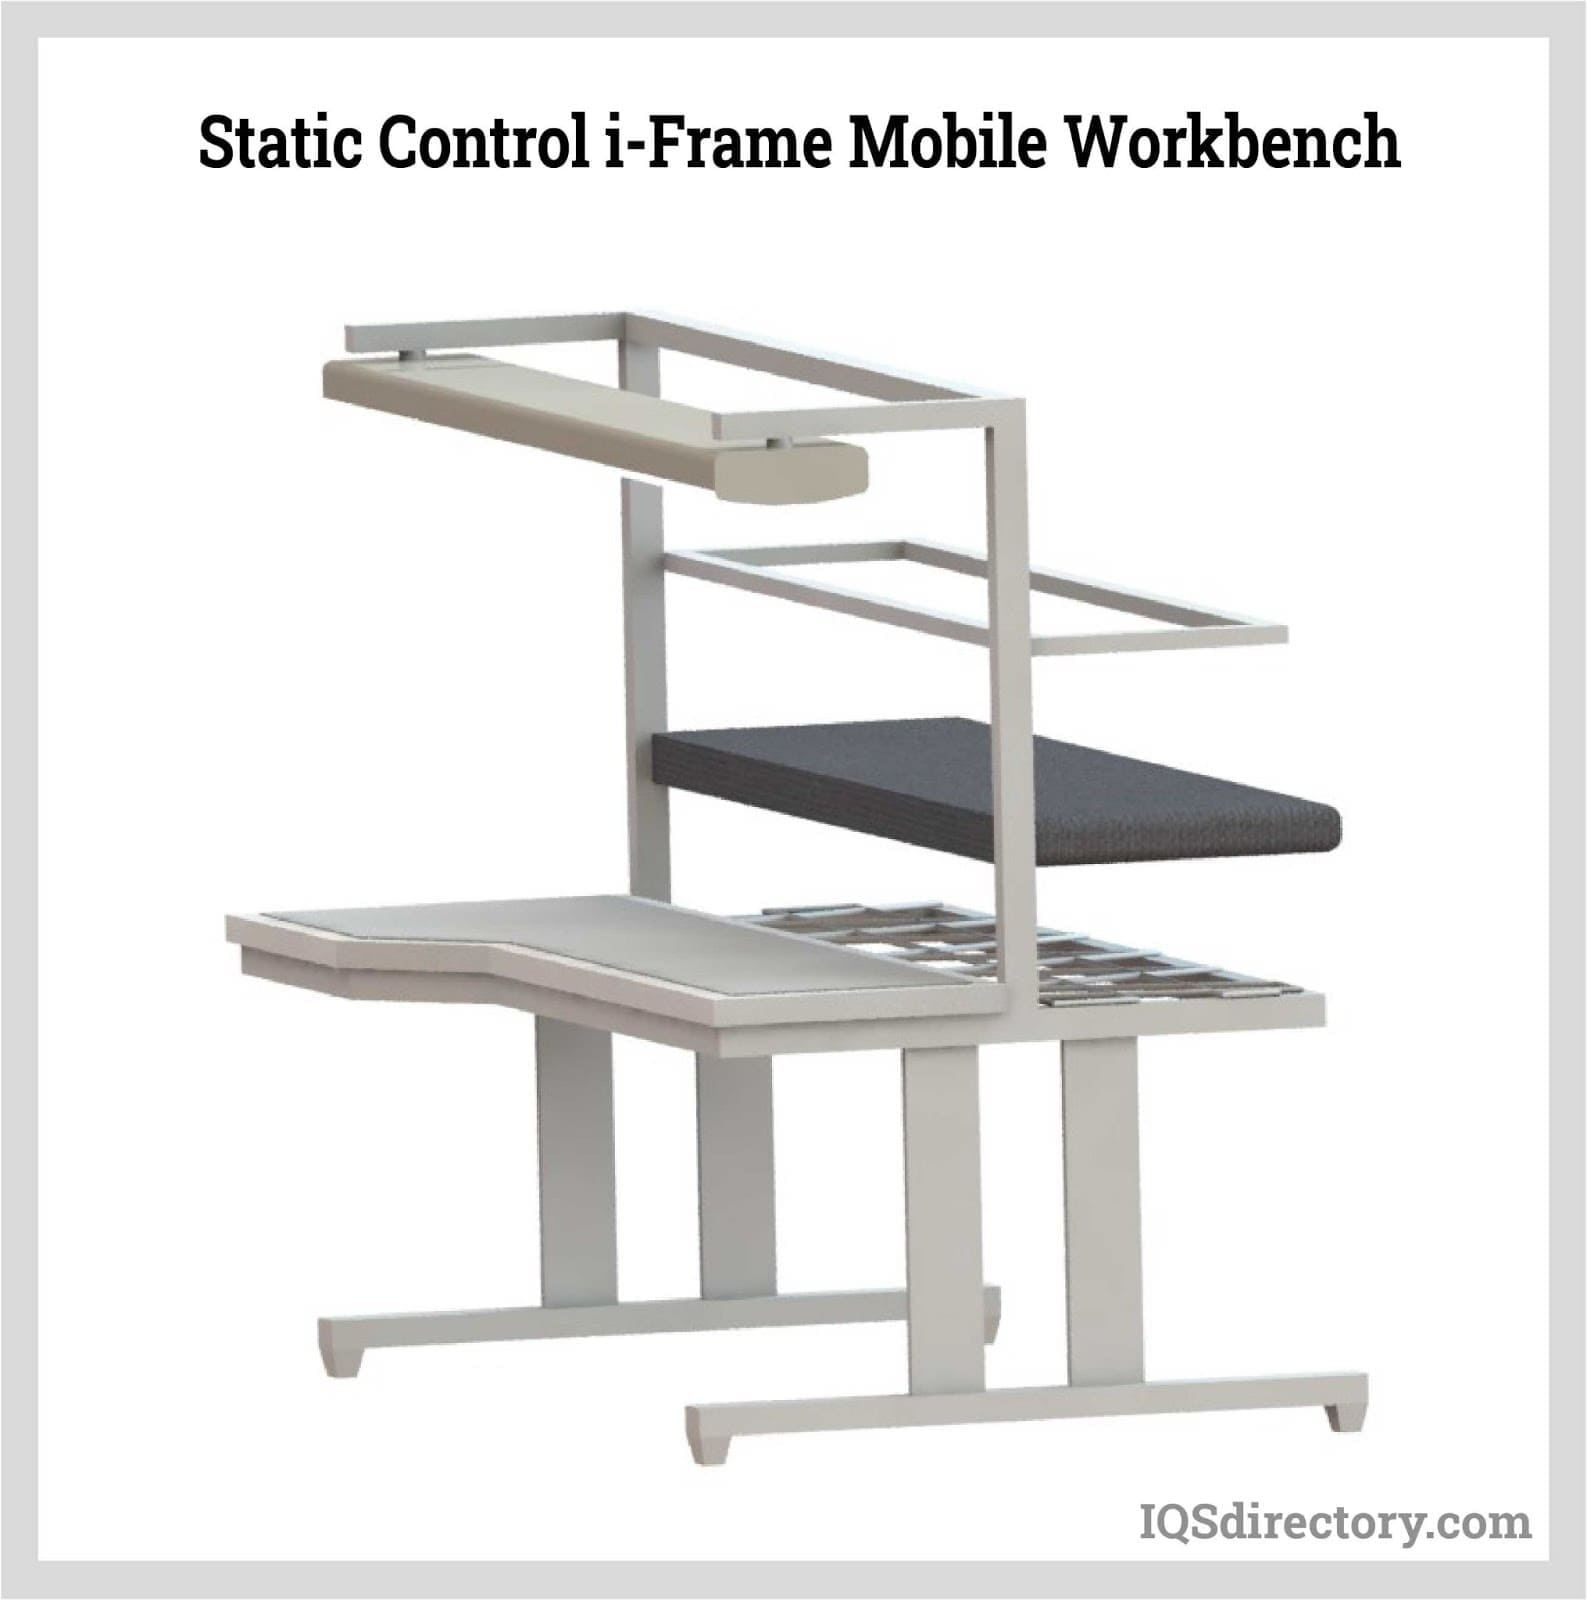 Static Control i-Frame Mobile Workbench